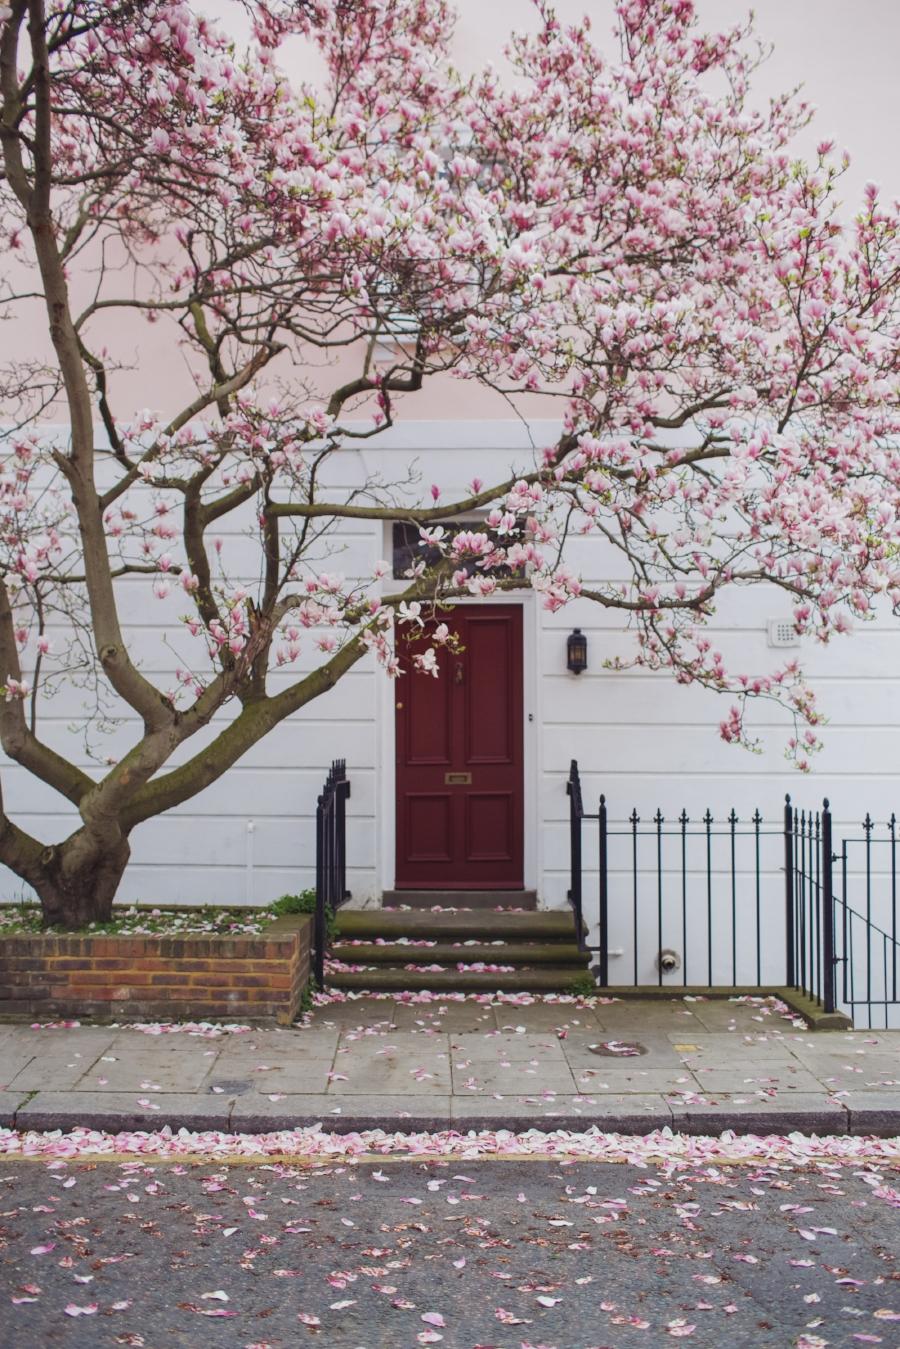 london-spring-magnolia-blossom-spring2017-springfashion-springstyle-puginclothes-bestdogblog-humanandhoundfashion-petfashionblog-dogfashionblog-humanandhoundblog-londonblogger-uk-clesea-pink-dogfriendly-dogblog-topdogblog-twinning-style-best